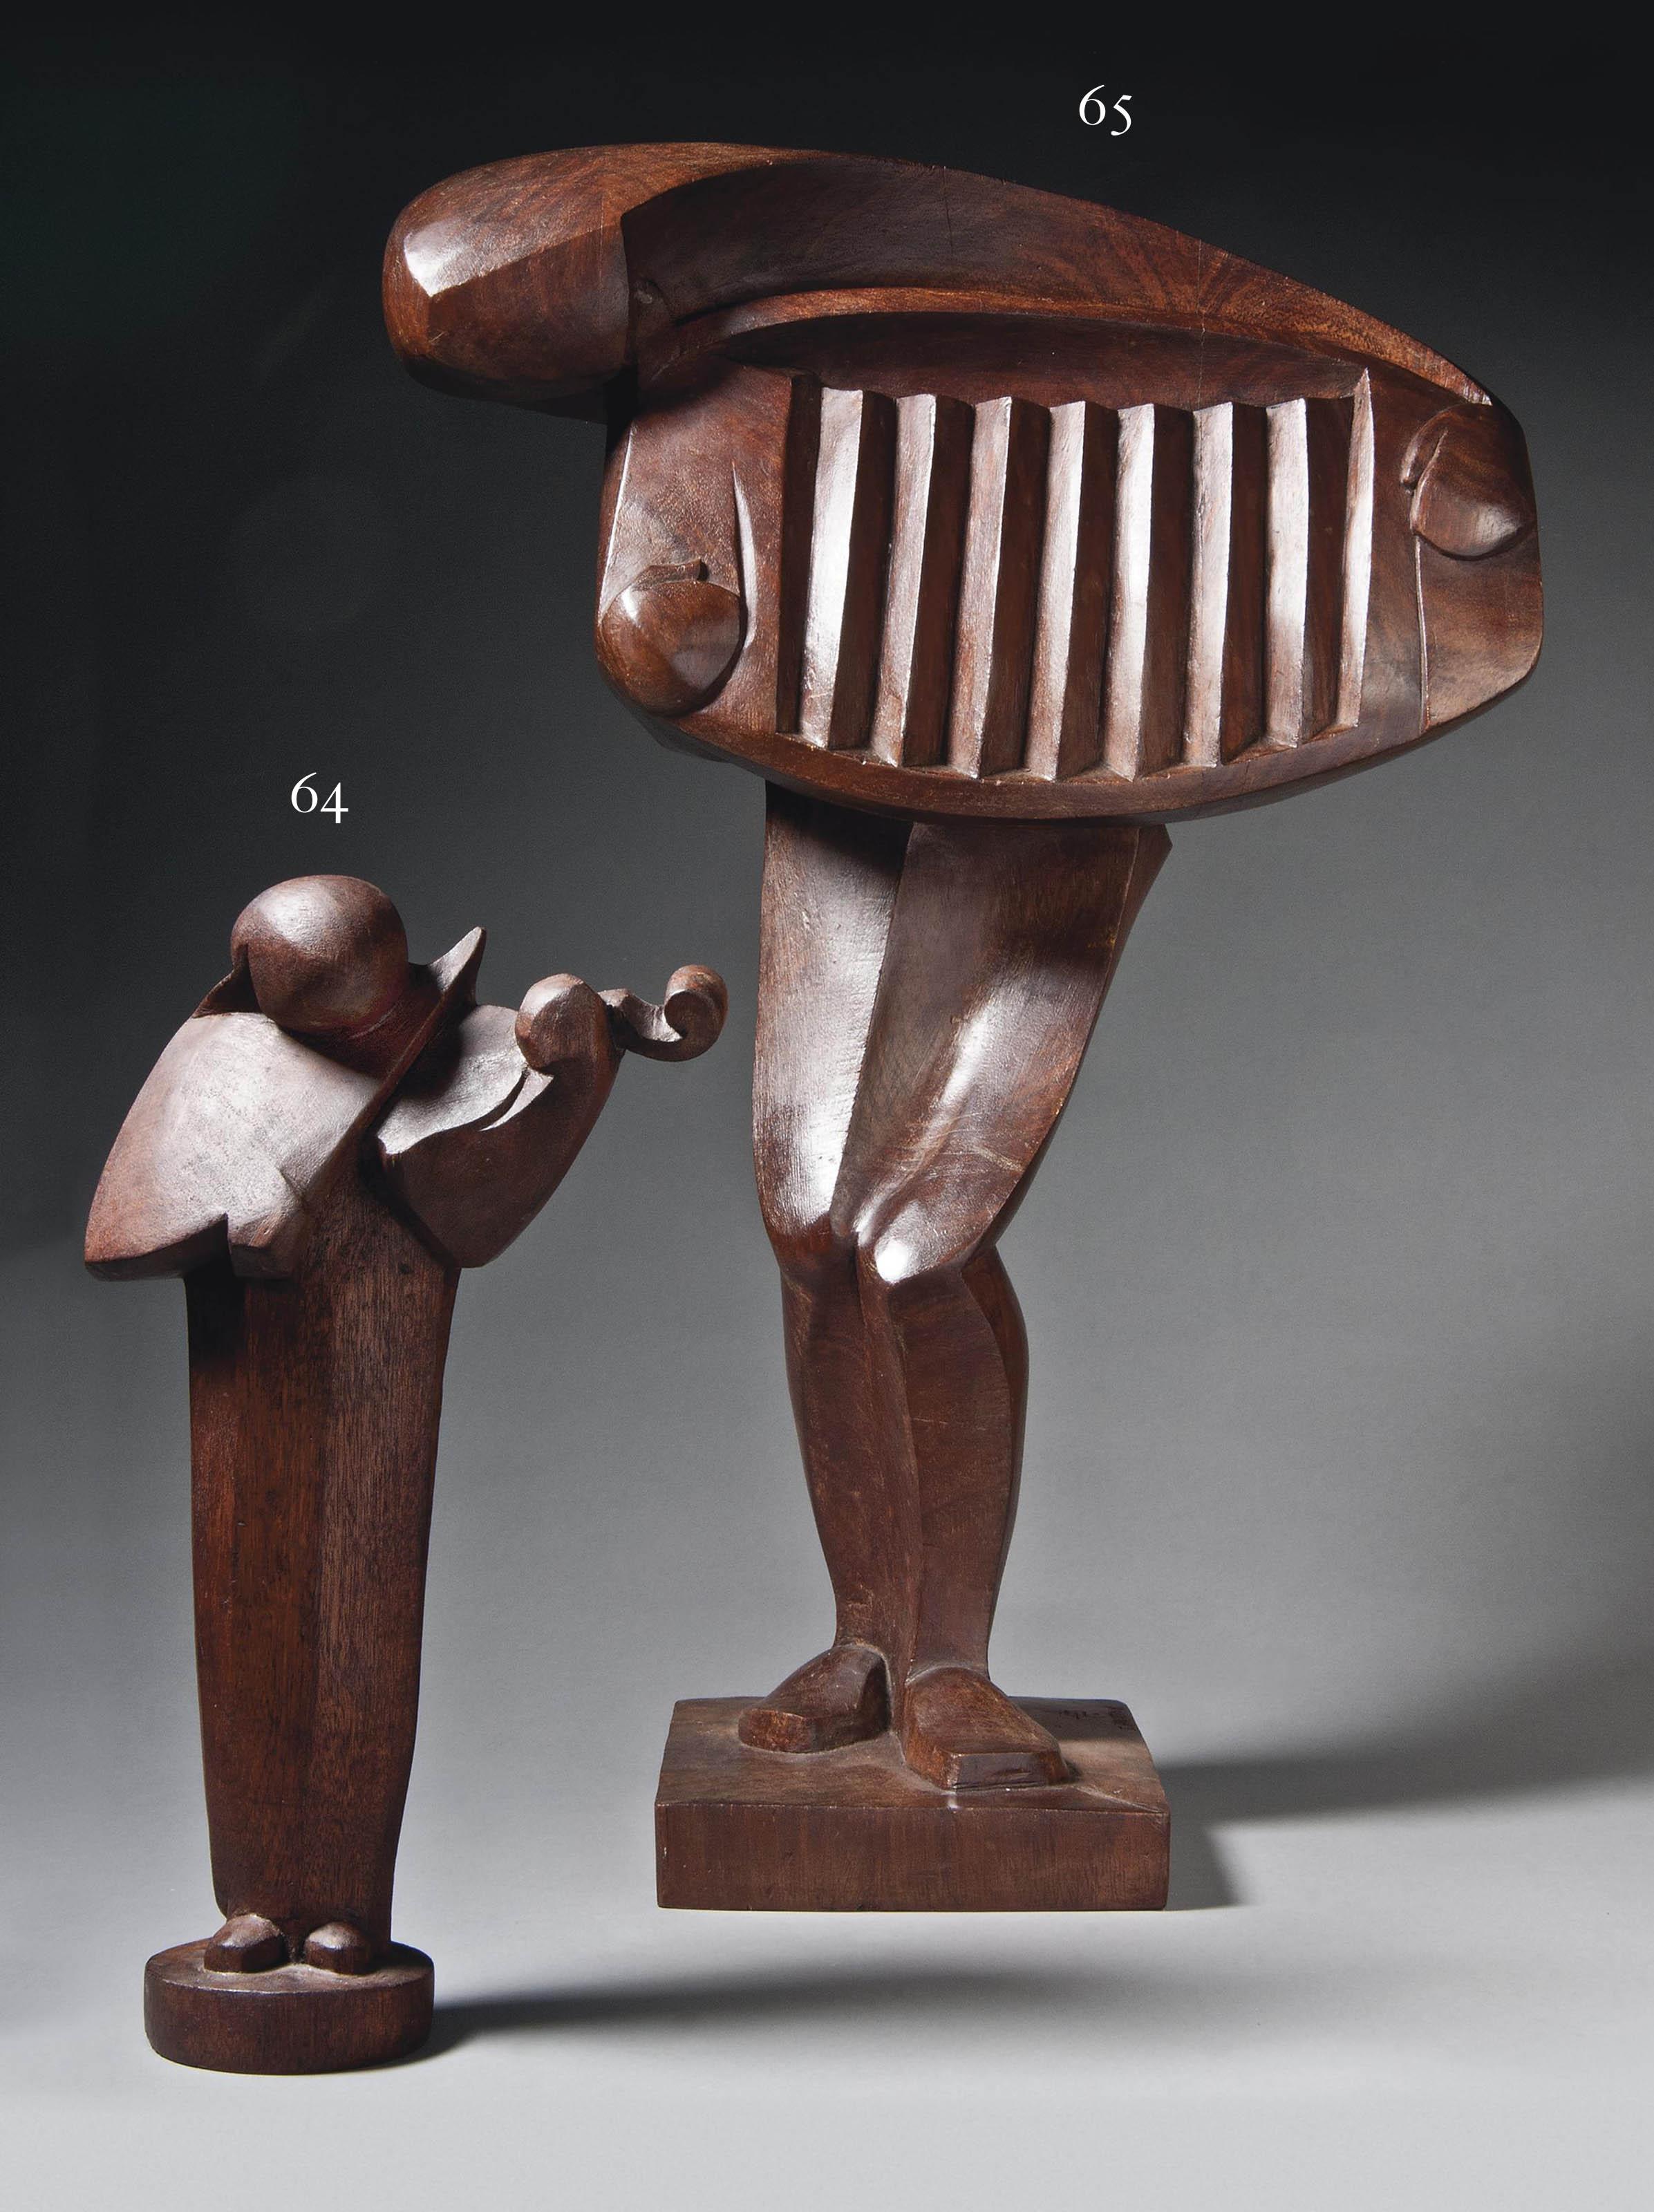 FERDINAND PARPAN (1902-2004)